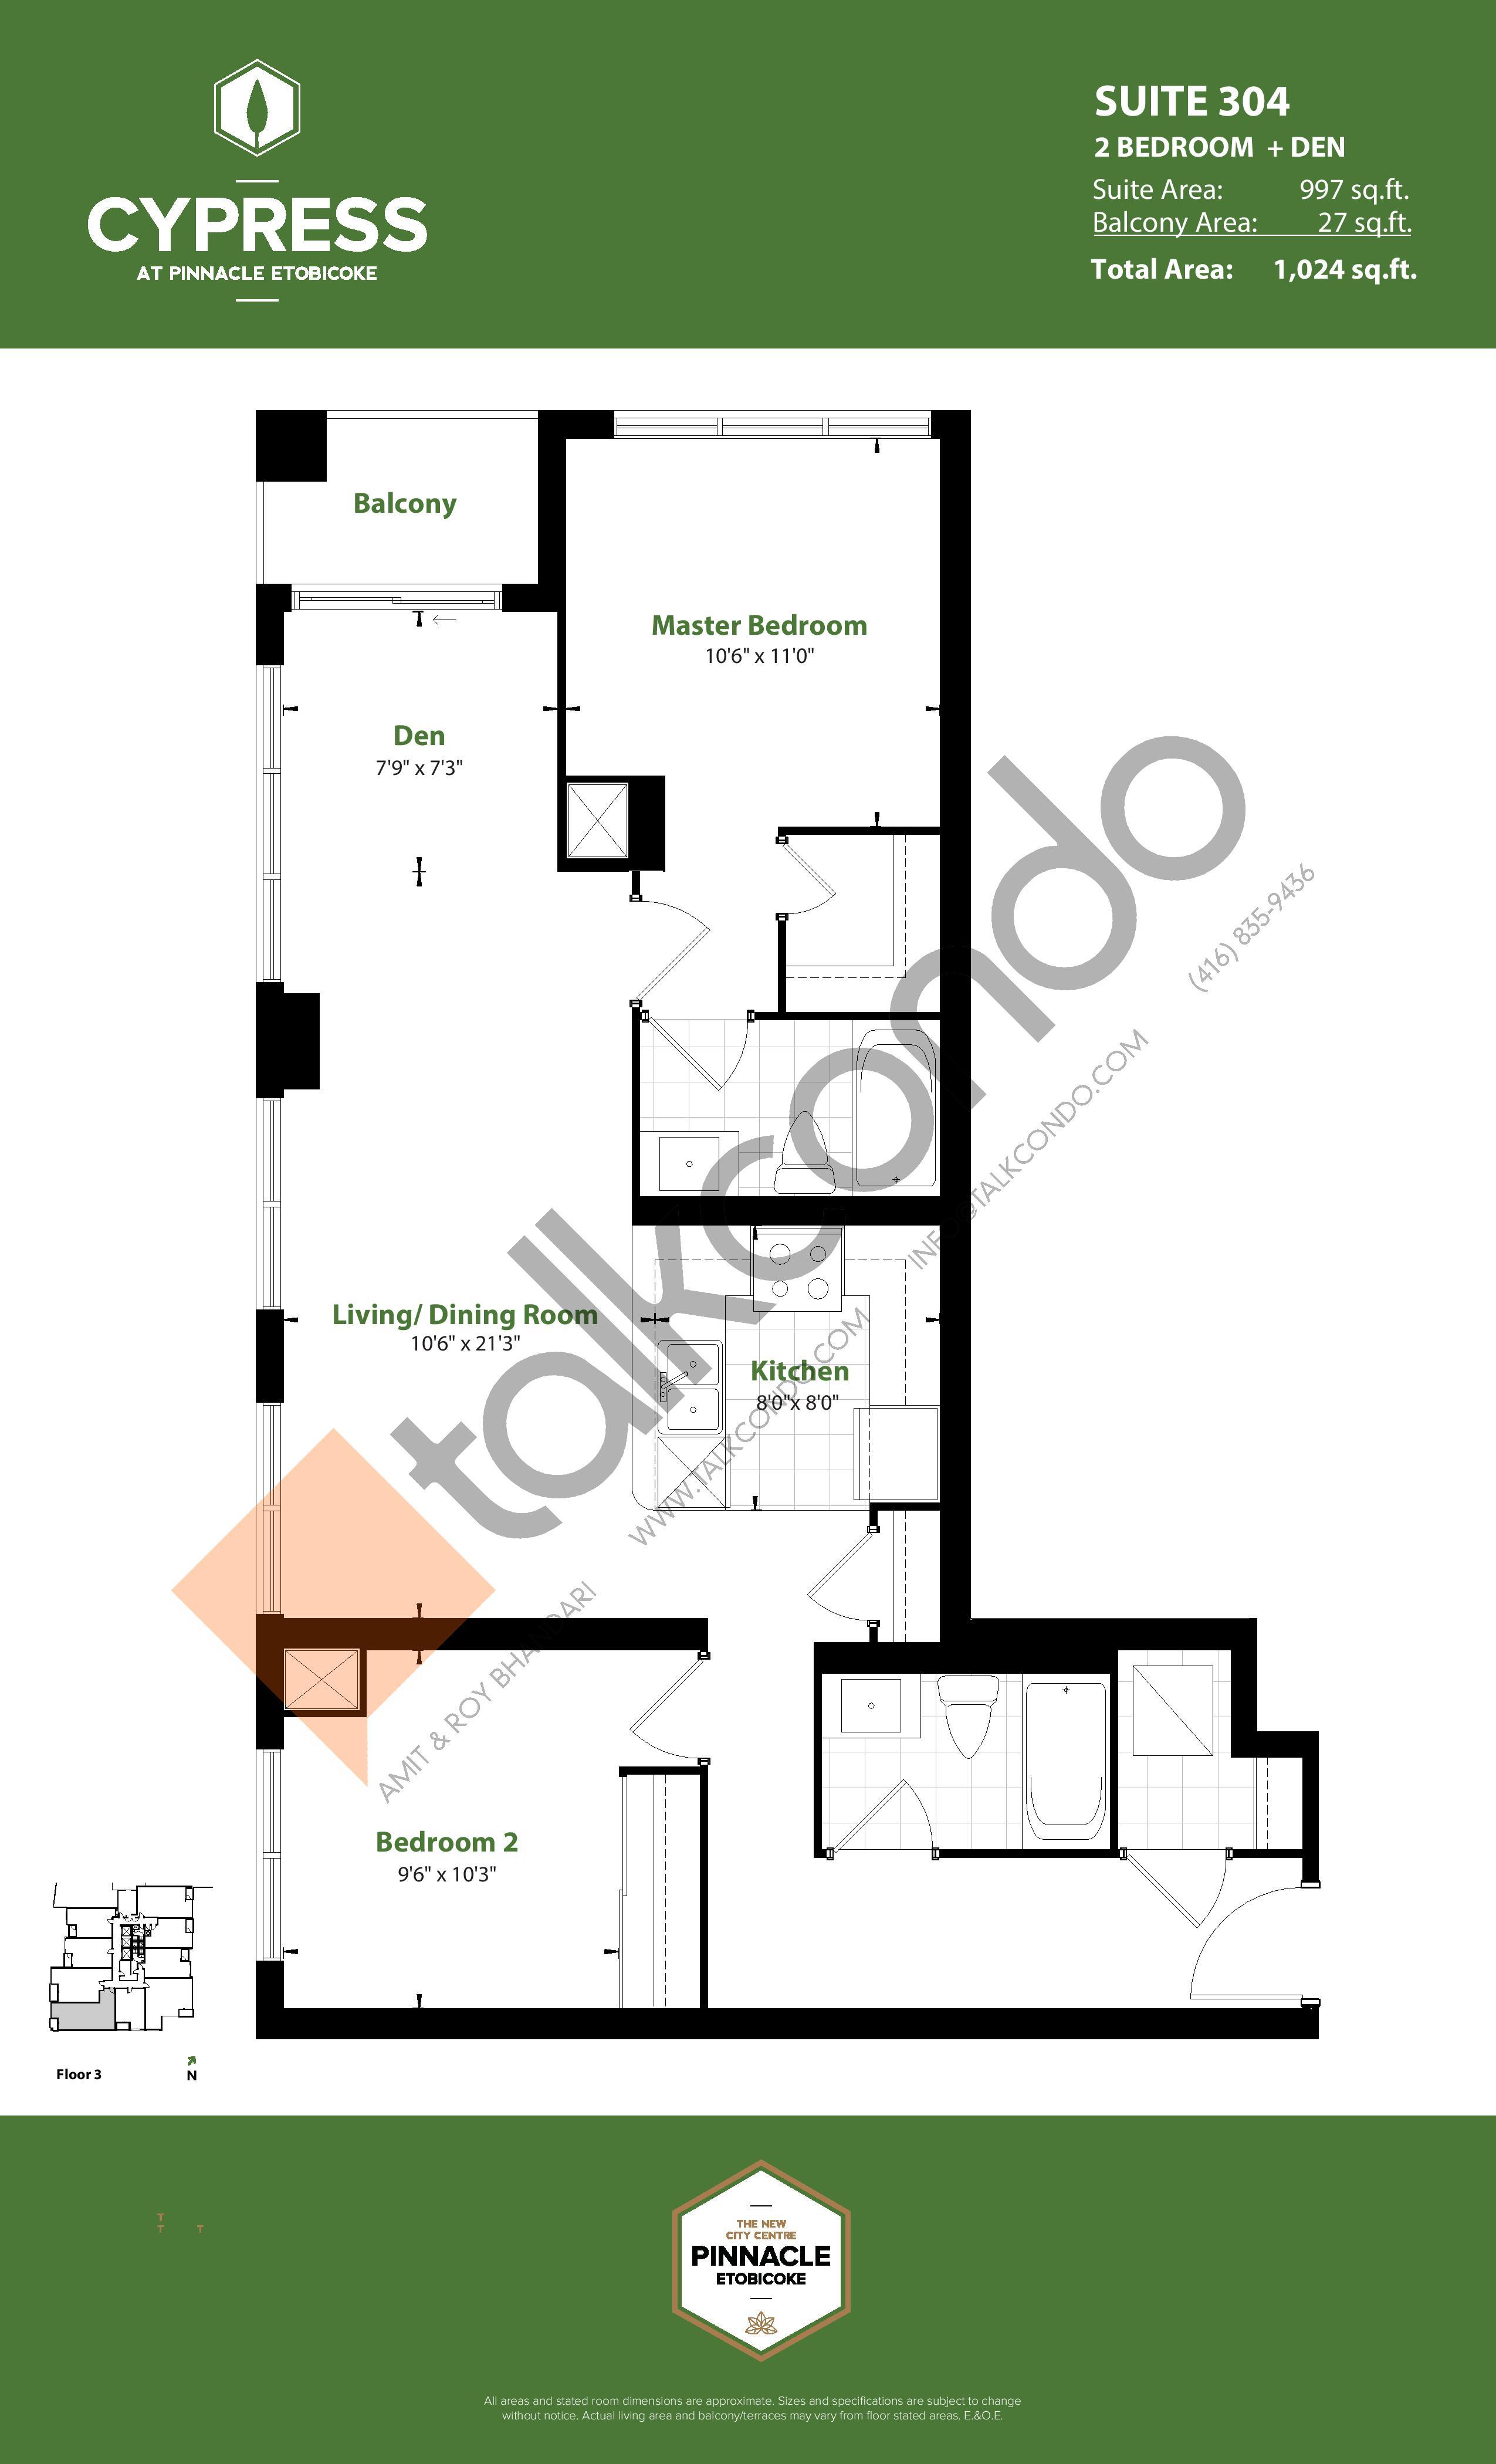 Suite 304 Floor Plan at Cypress at Pinnacle Etobicoke - 997 sq.ft